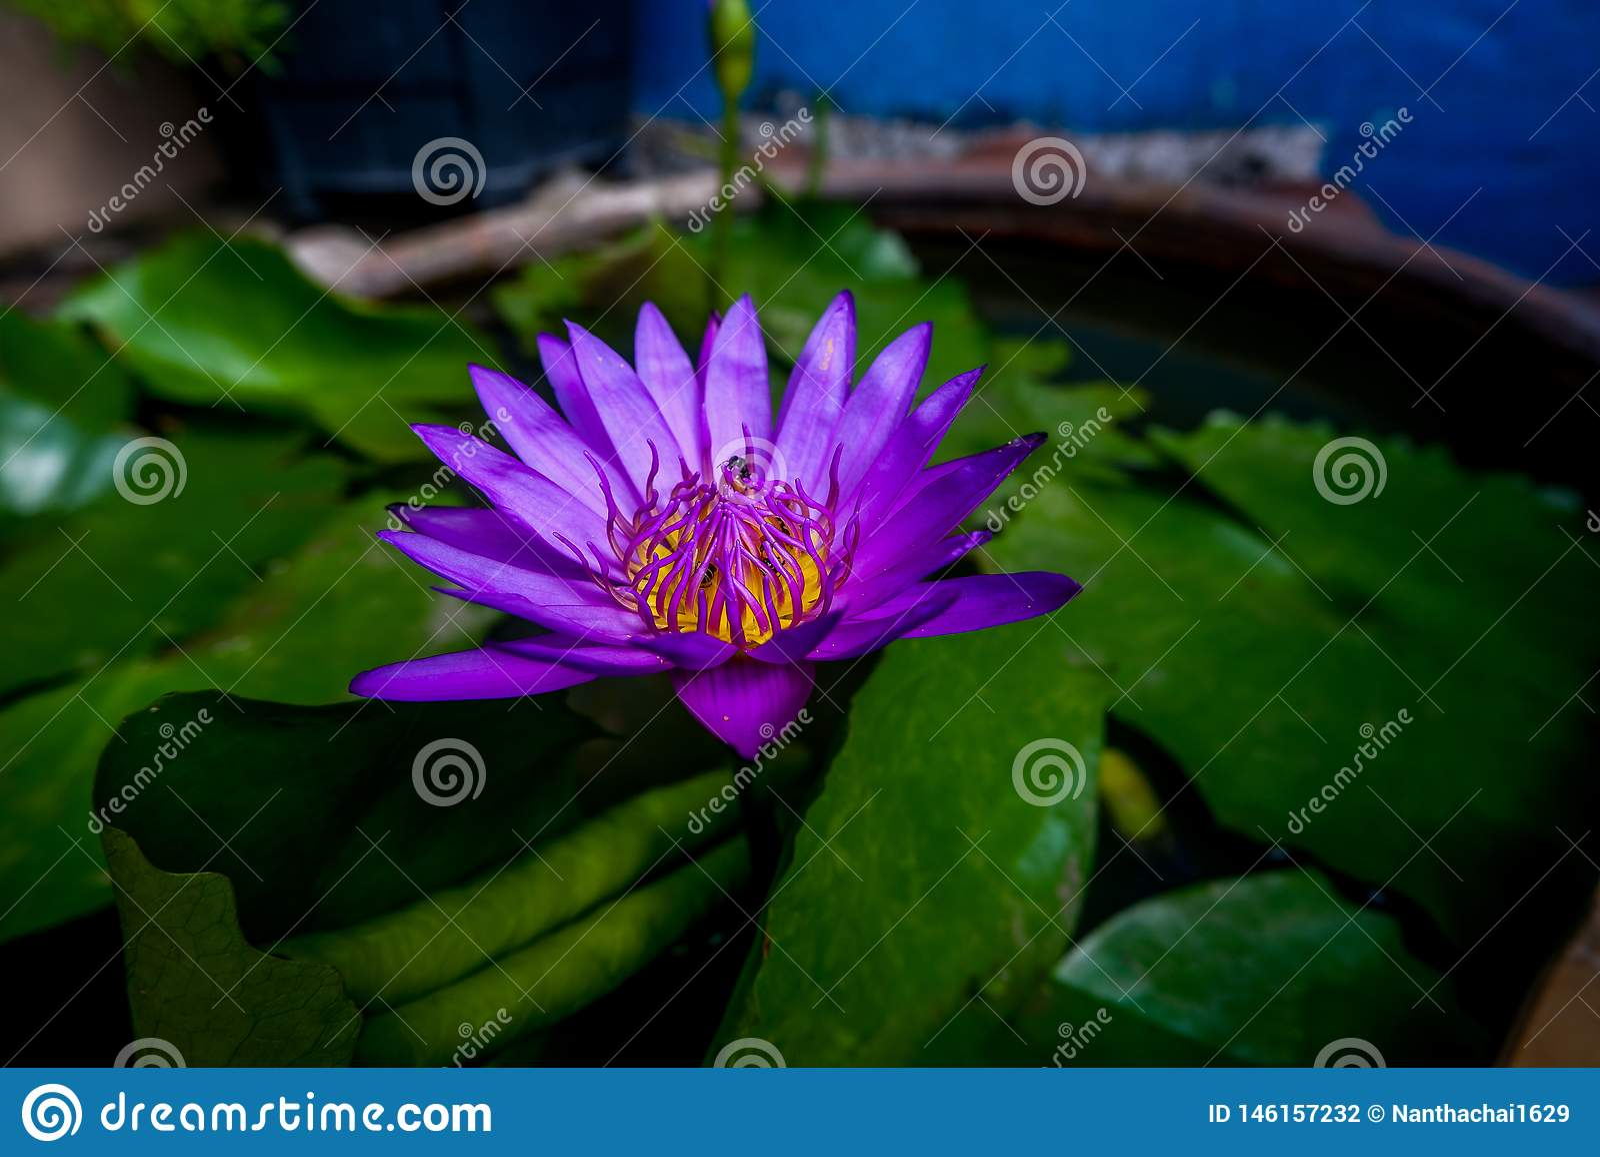 De purpere lotusbloem heeft bijen in de lotusbloembloem